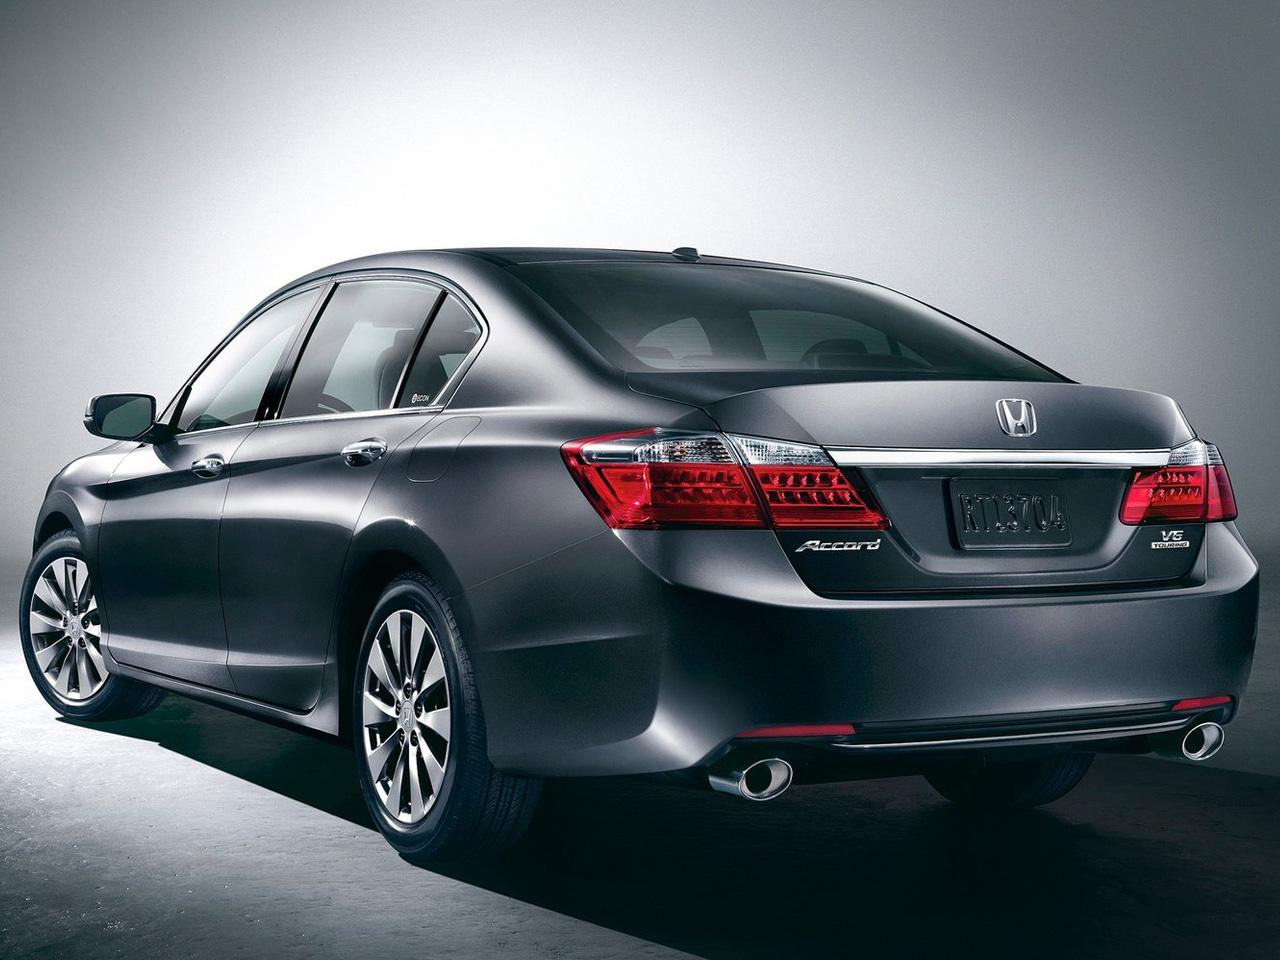 ... Dealer%203015%20Images/2013%20accord/2013-Honda-Accord-Sedan-Rear